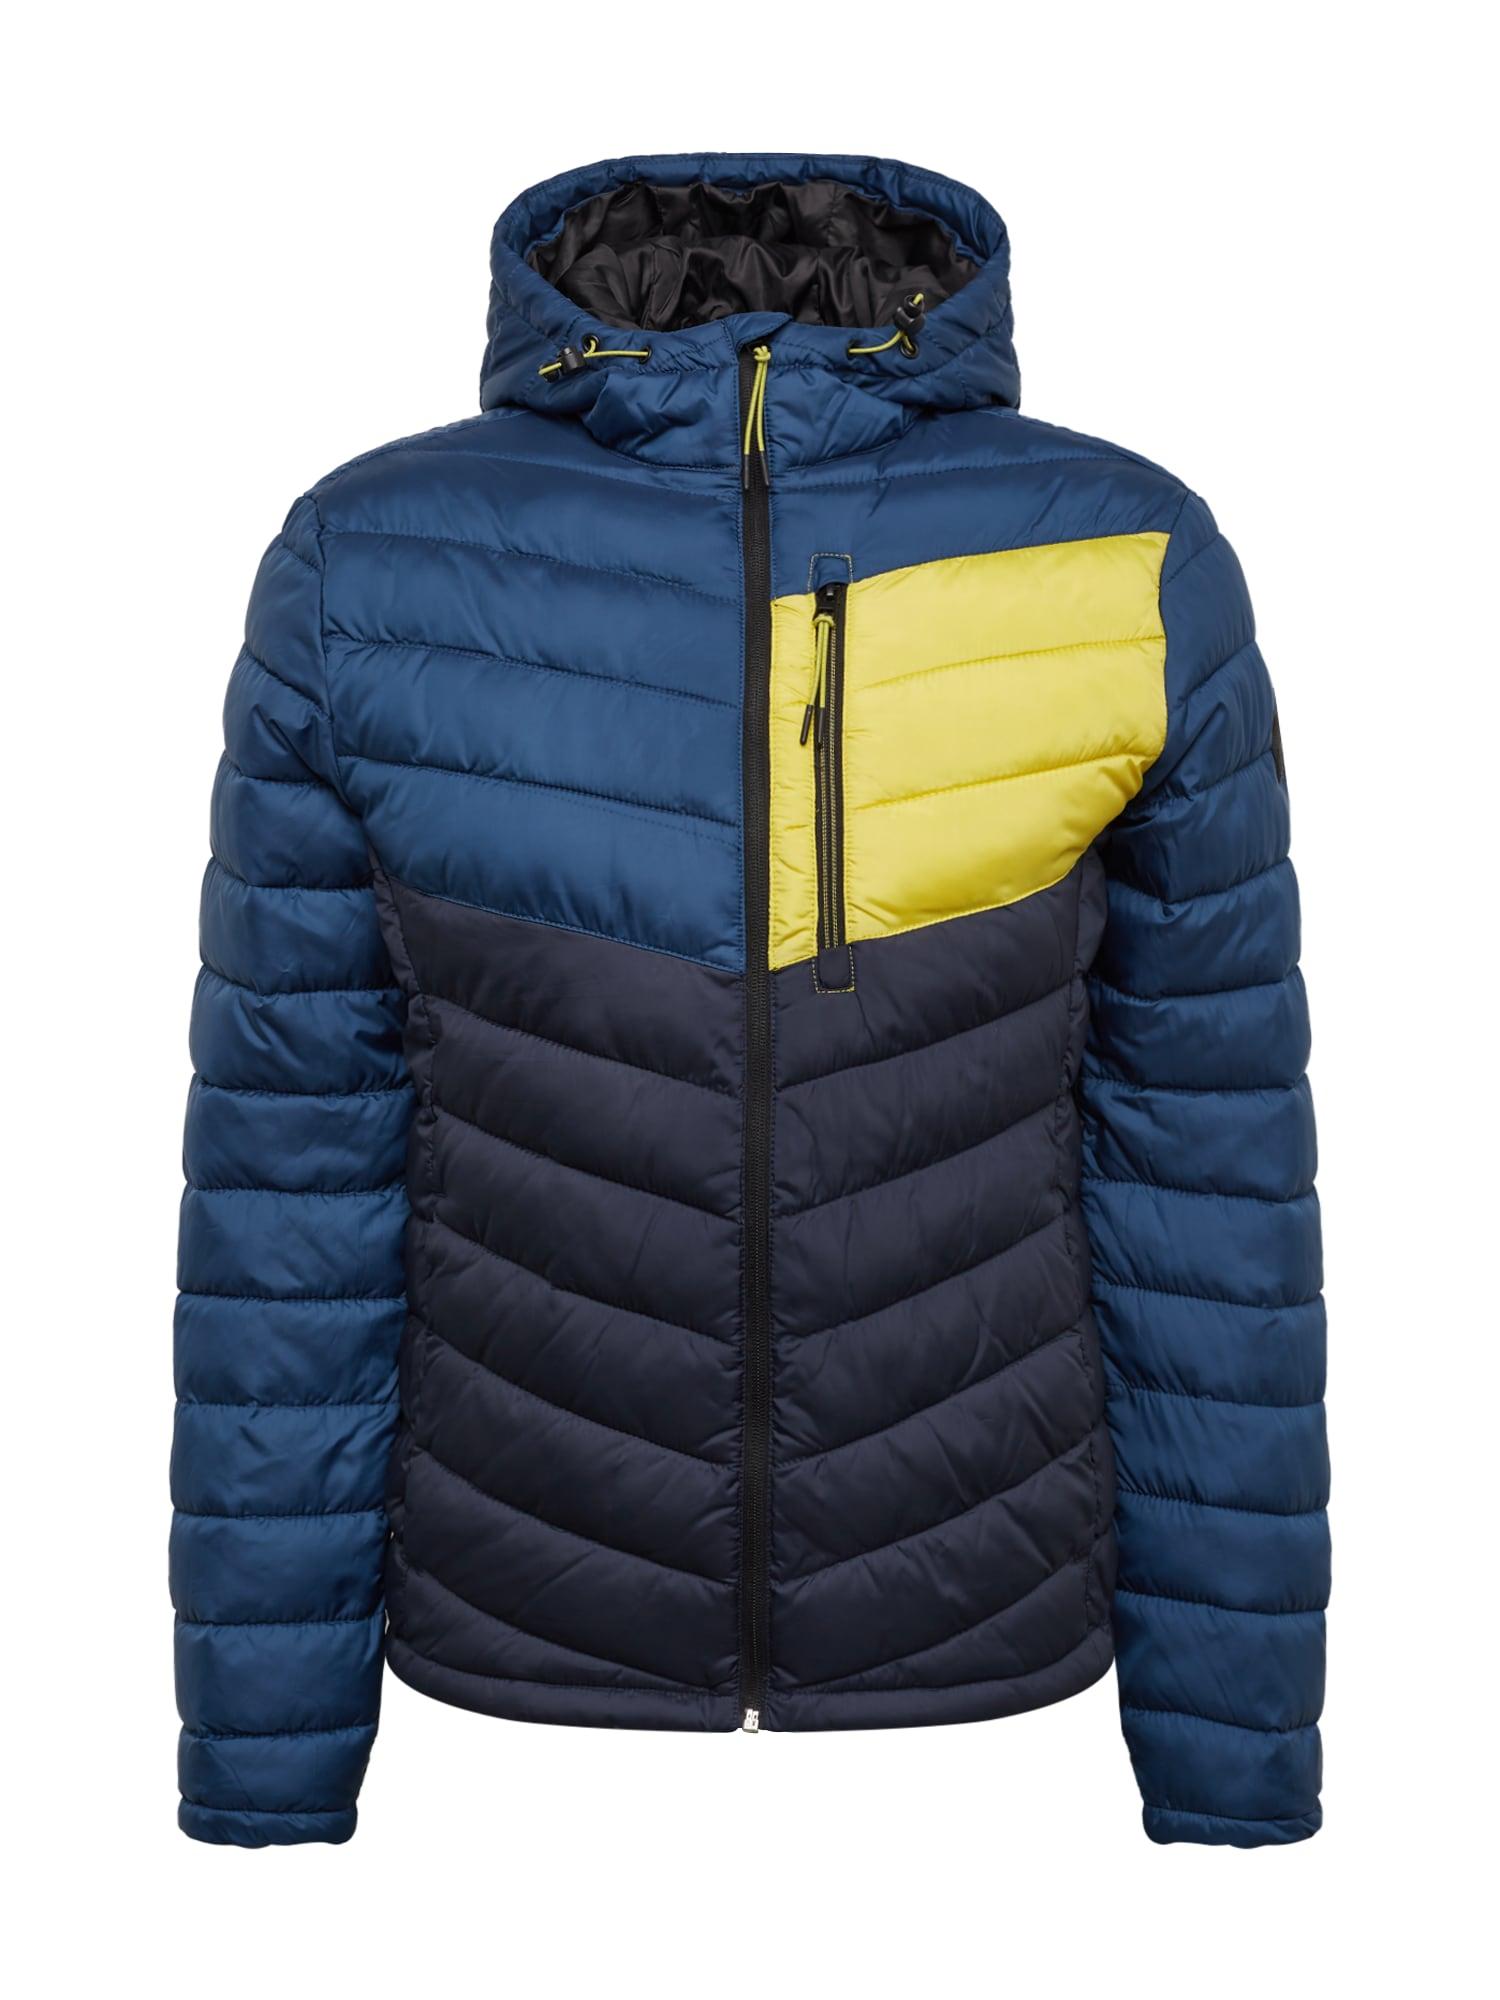 Zimní bunda tmavě modrá TOM TAILOR